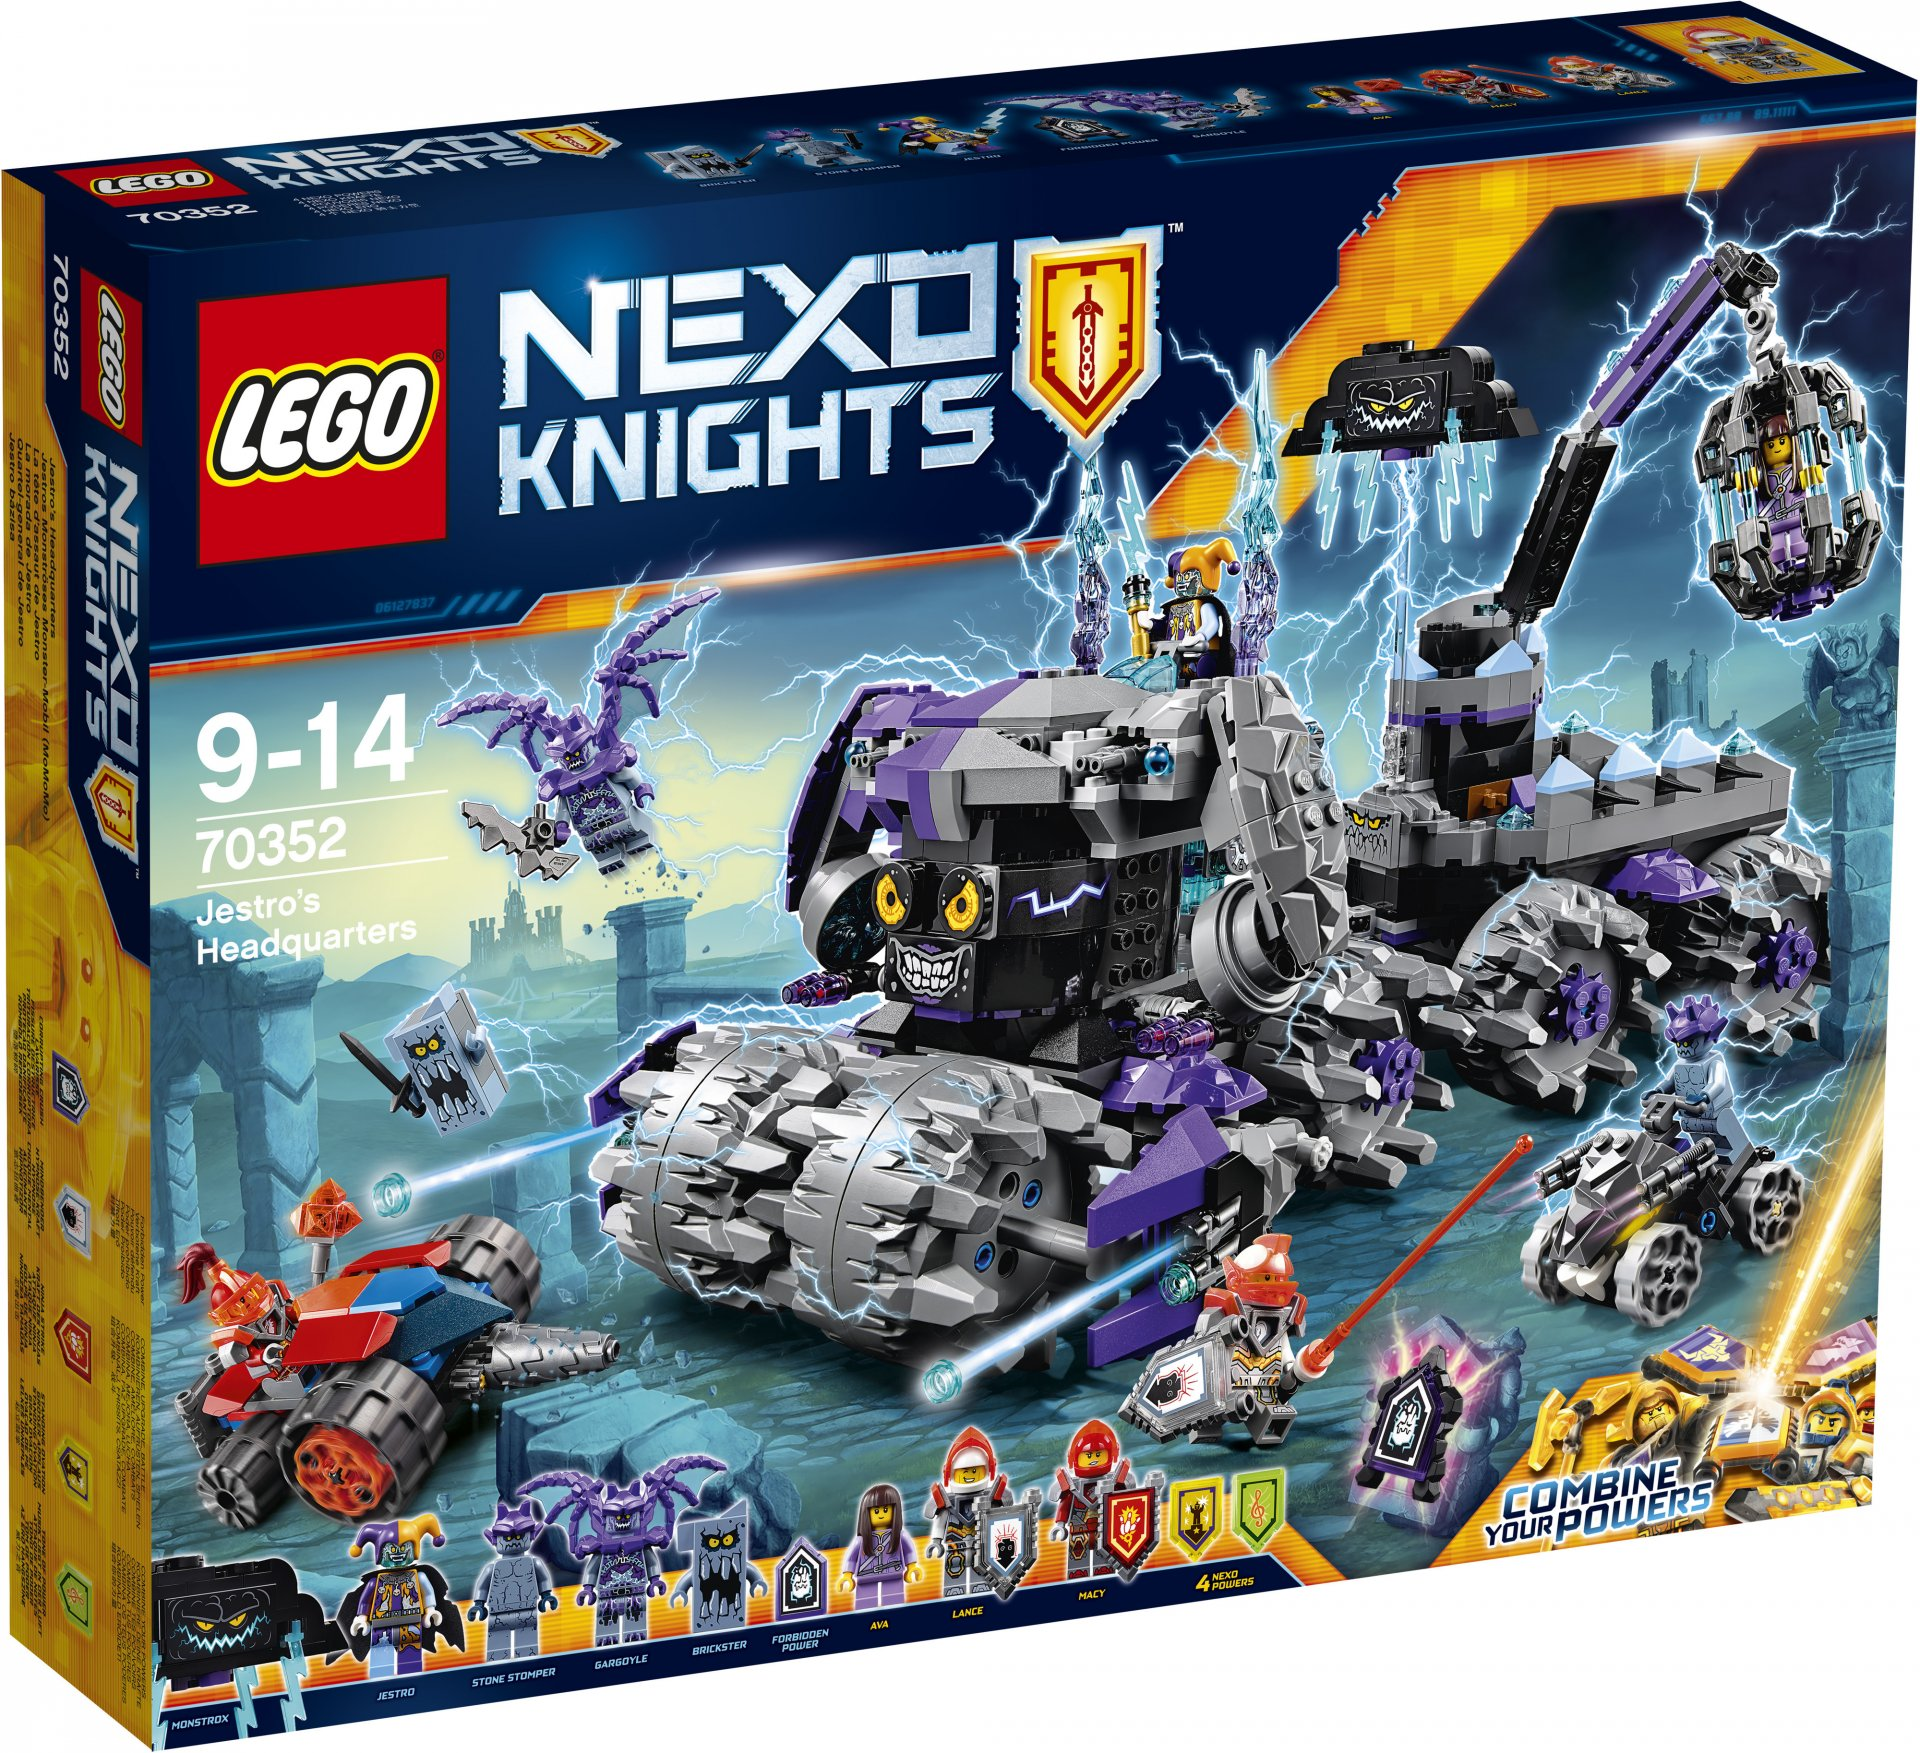 LEGO Knights Nexo 70352 - Армия Джестро стол раскладной сп 04 1 лдсп ноче экко